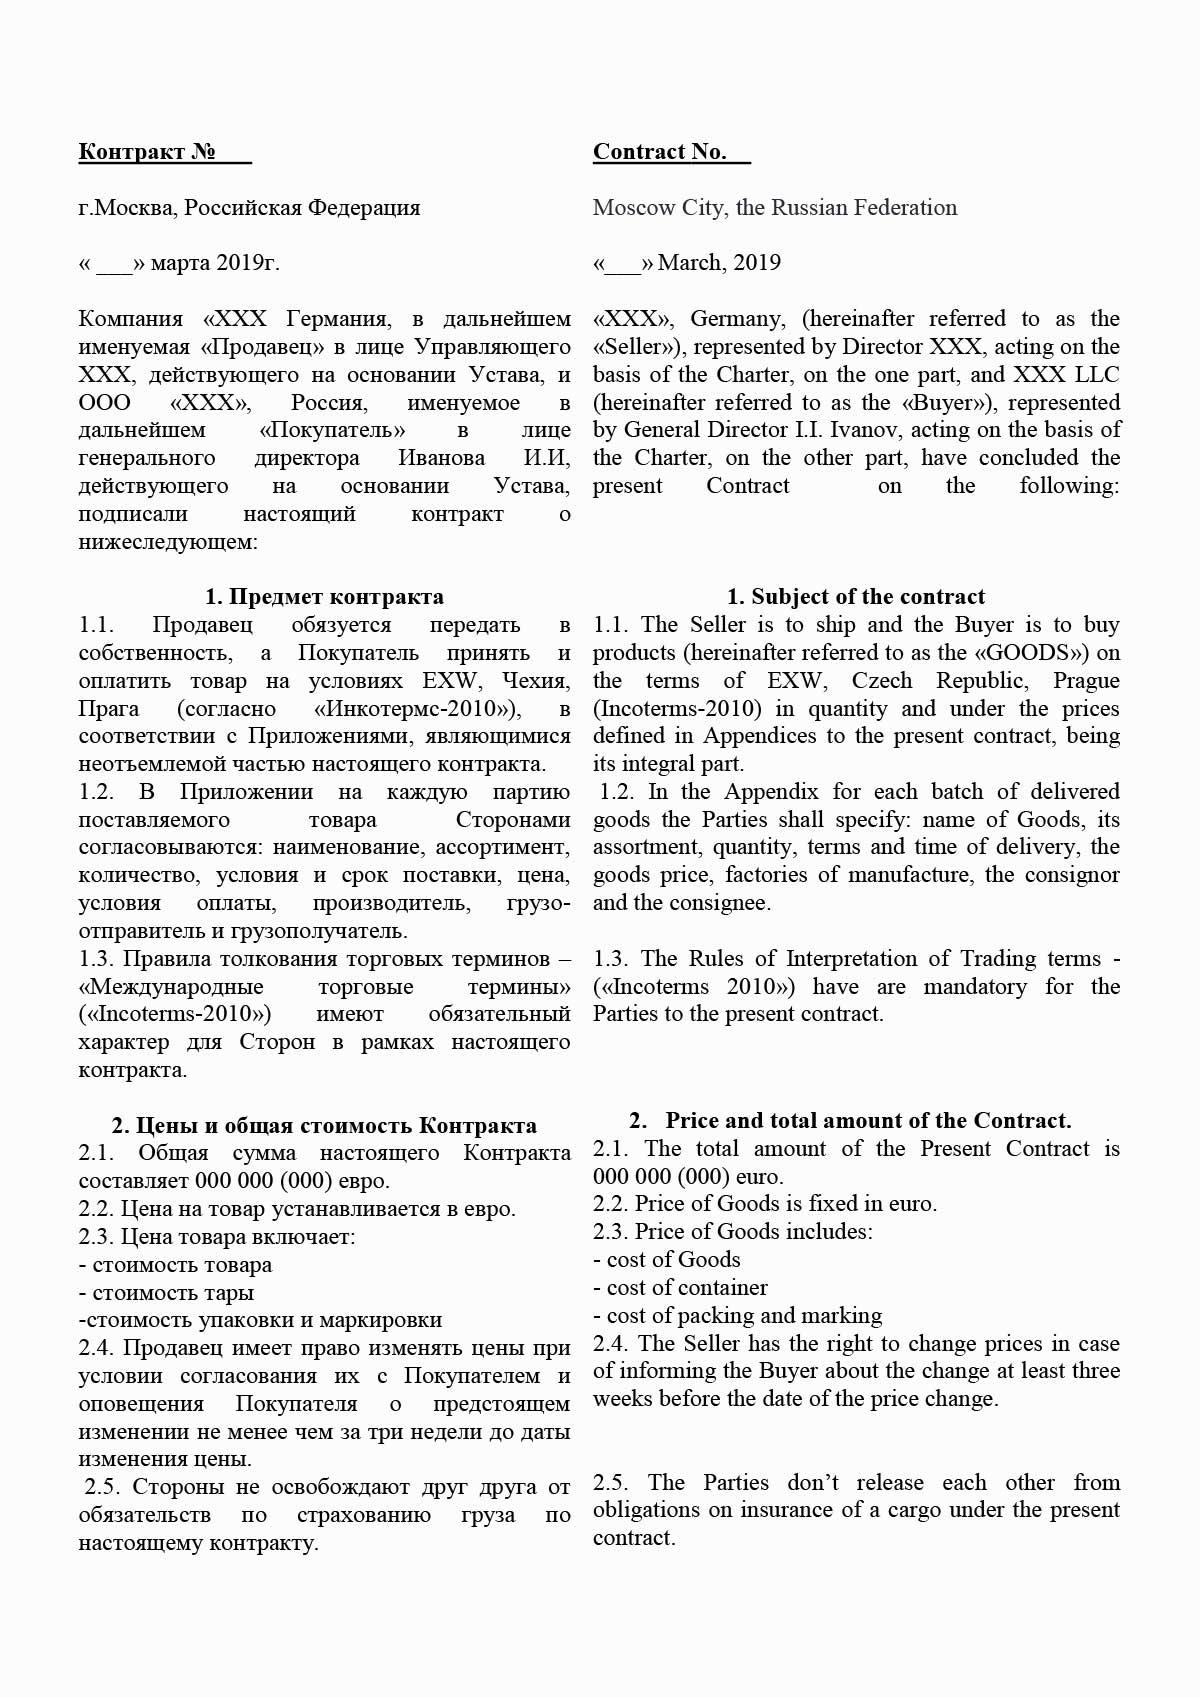 Перевод контракта ВЭД